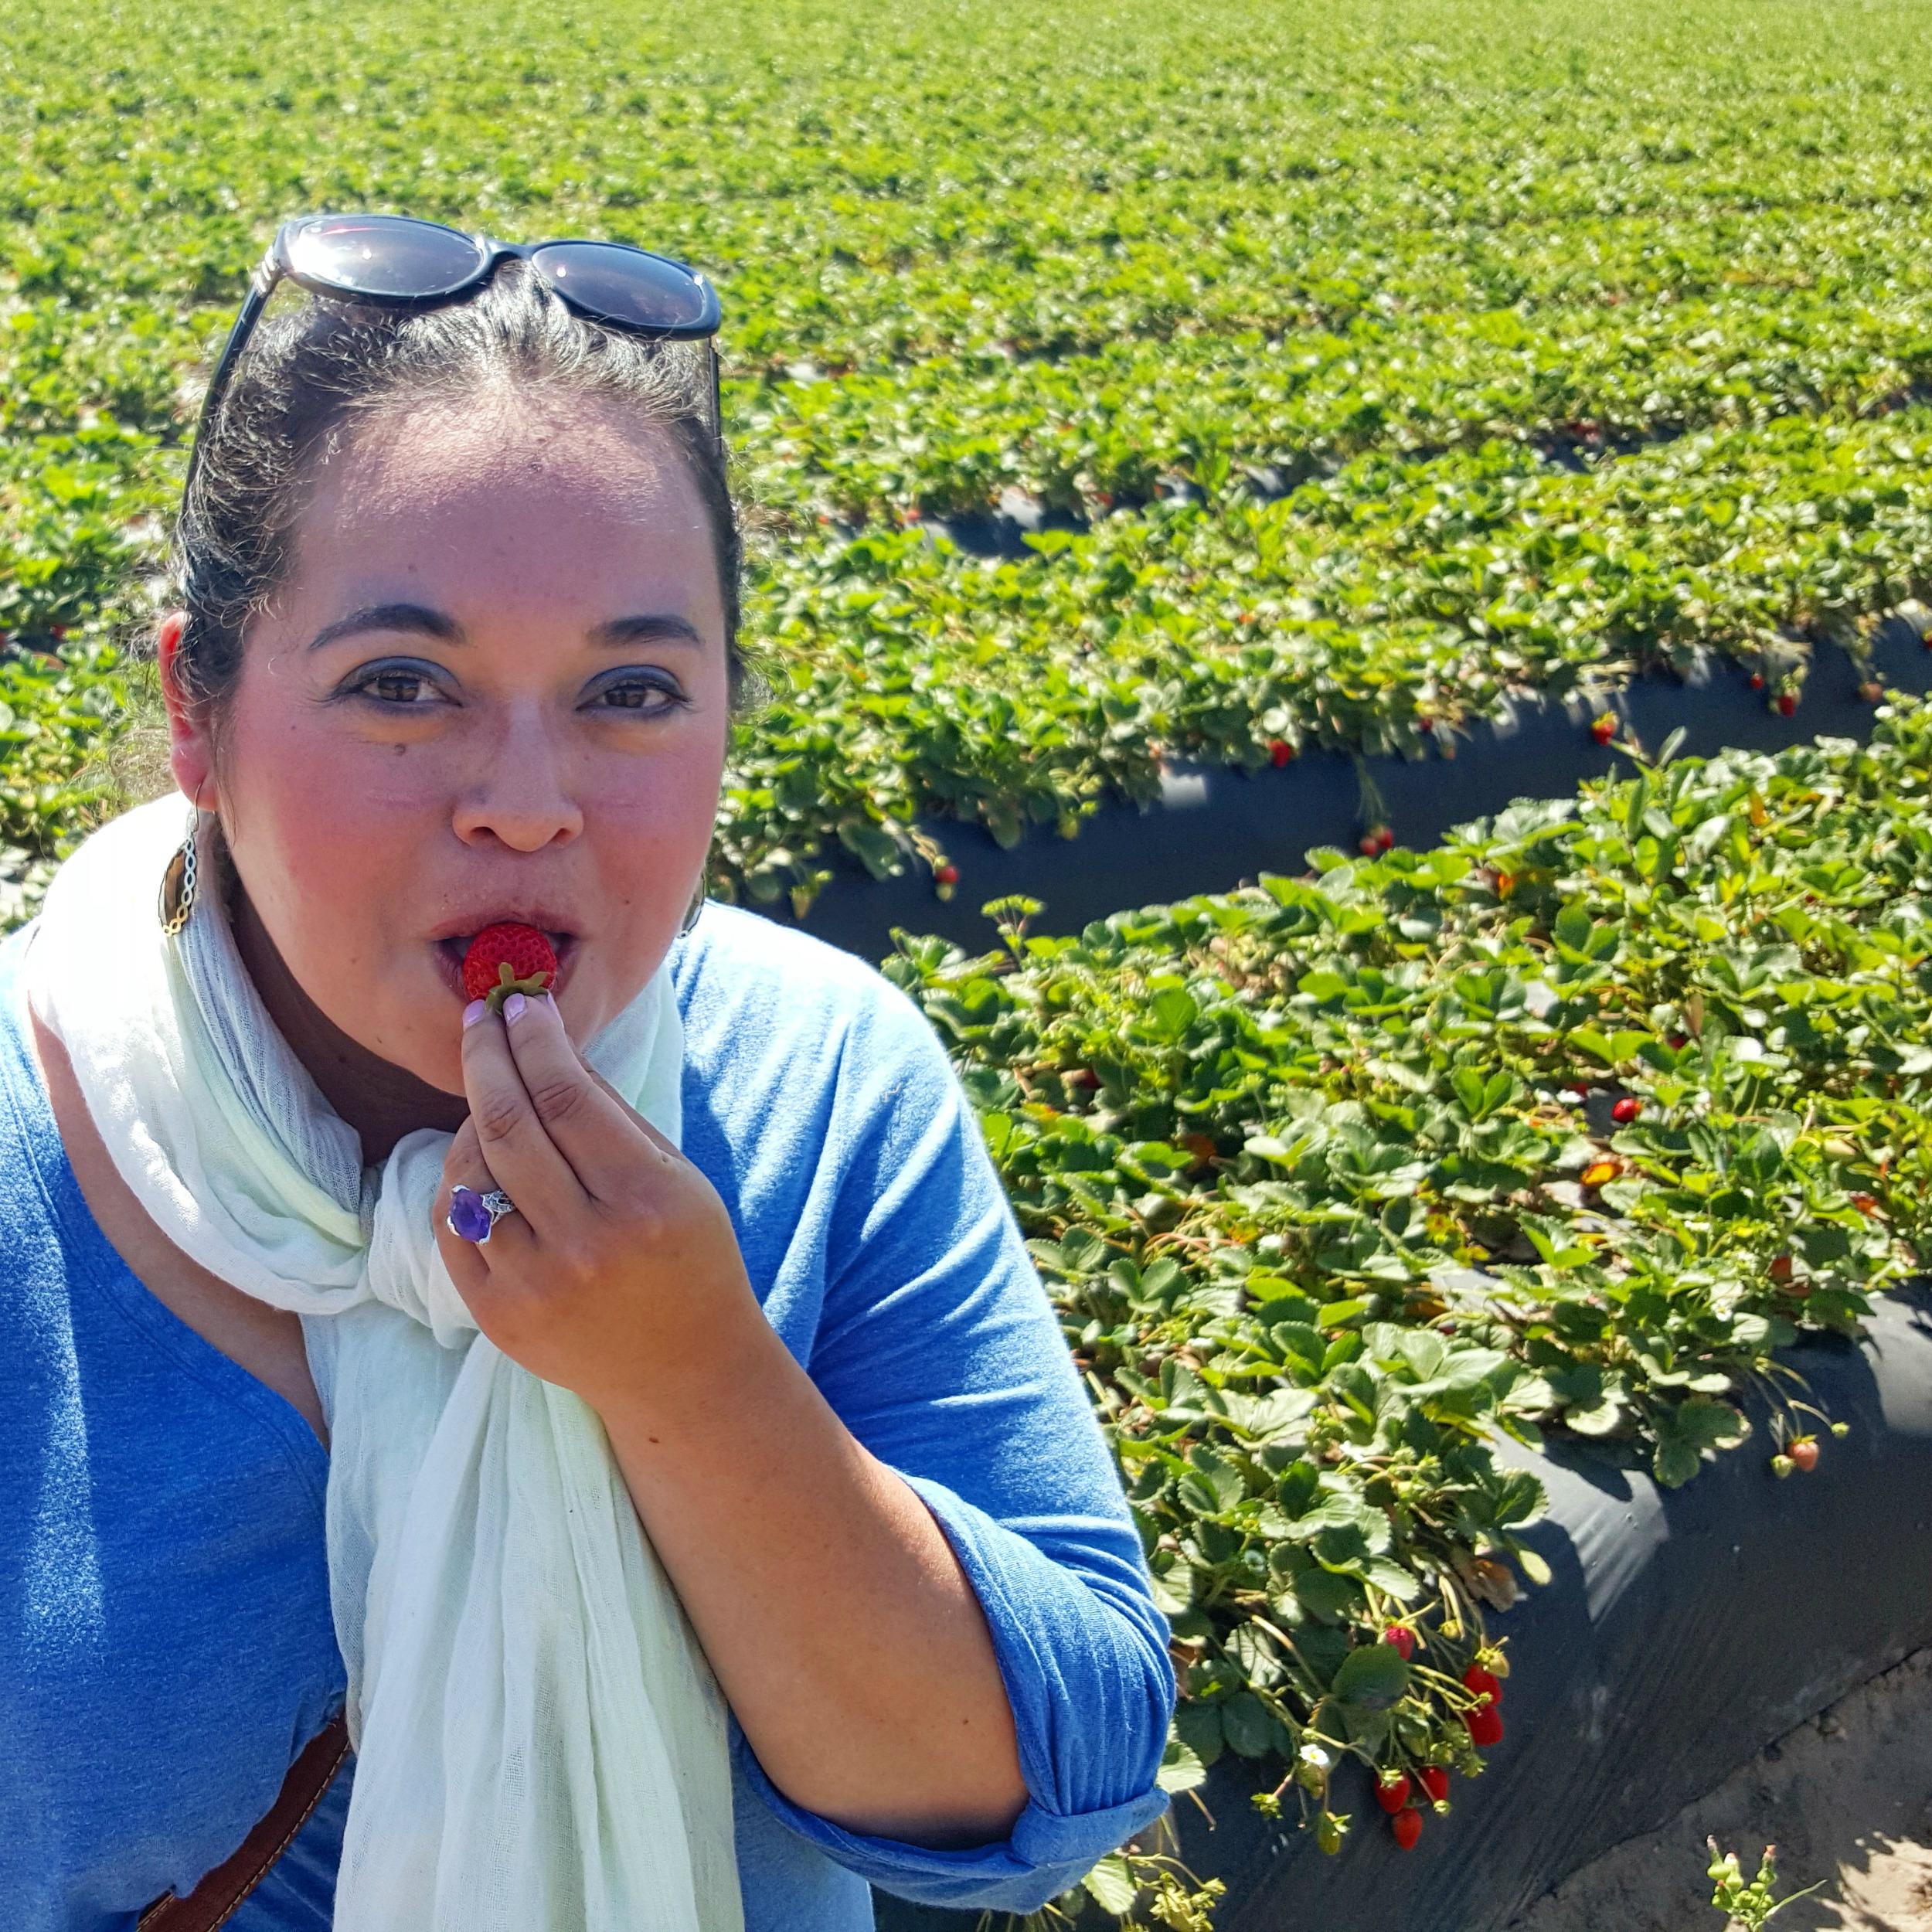 vianney-rodriguez-sweetlifebake-strawberry